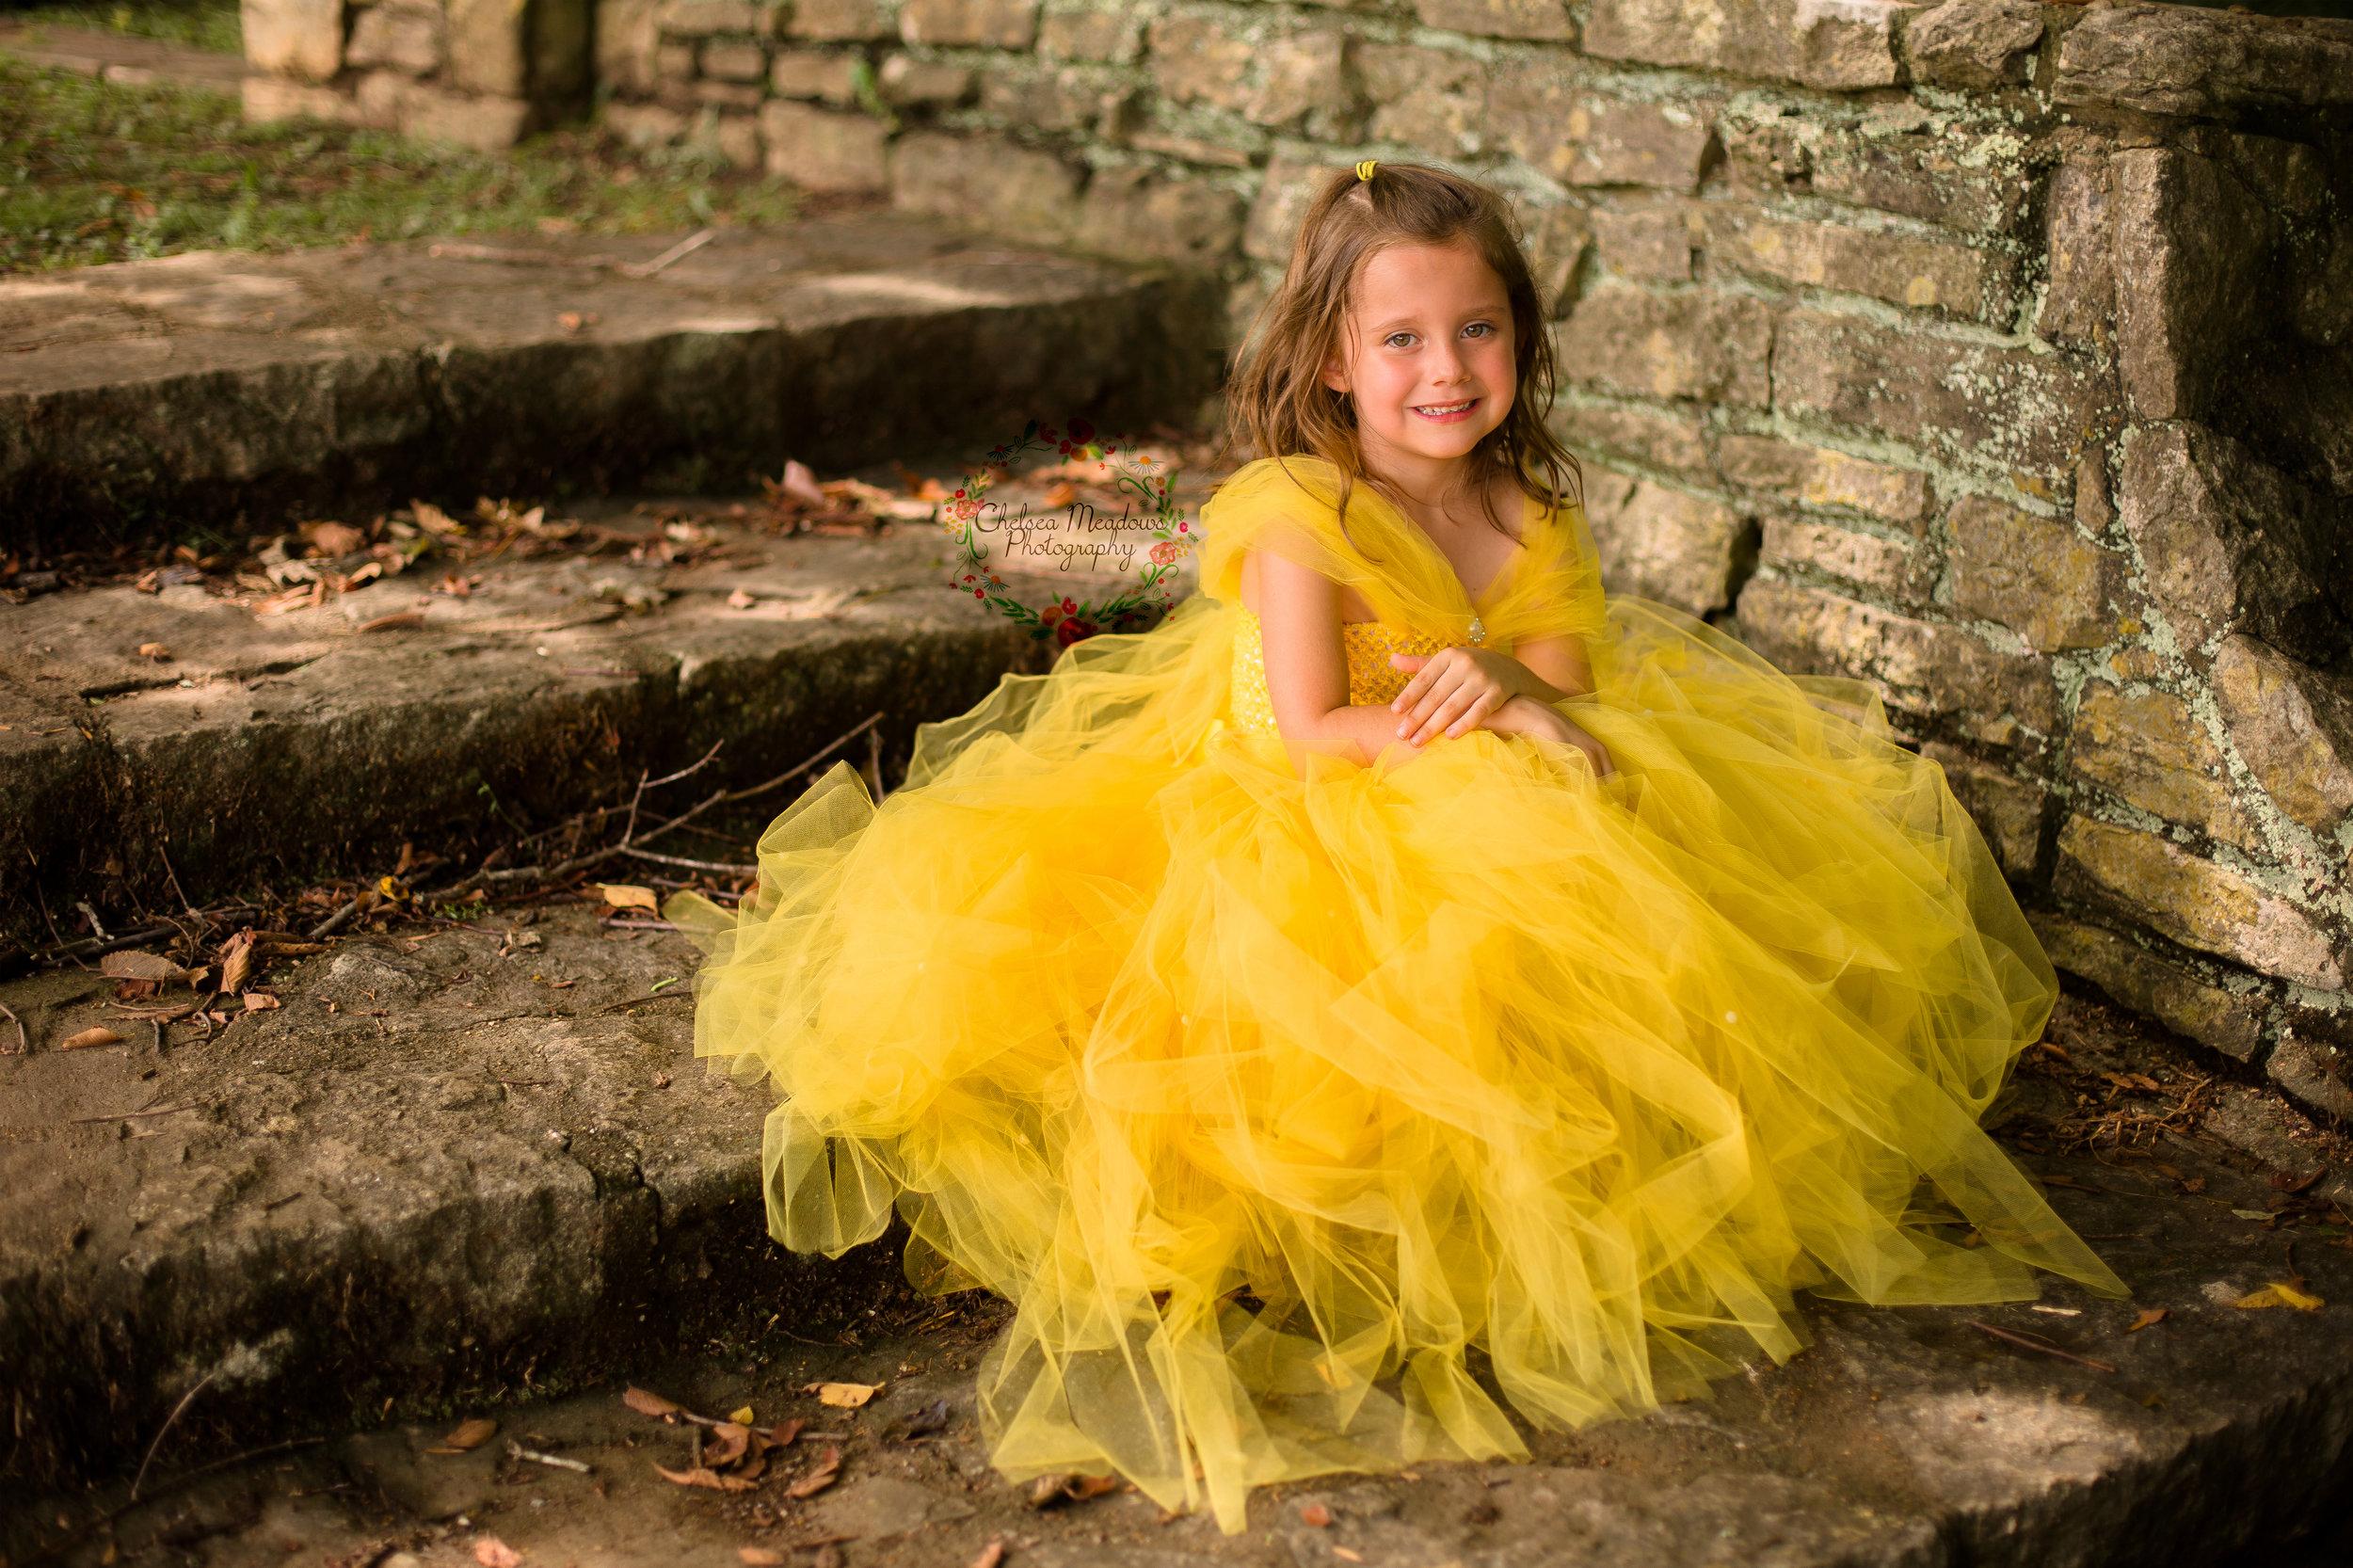 April 6th Birthday - Nashville Family Photographer - Chelsea Meadows Photography (2).jpg